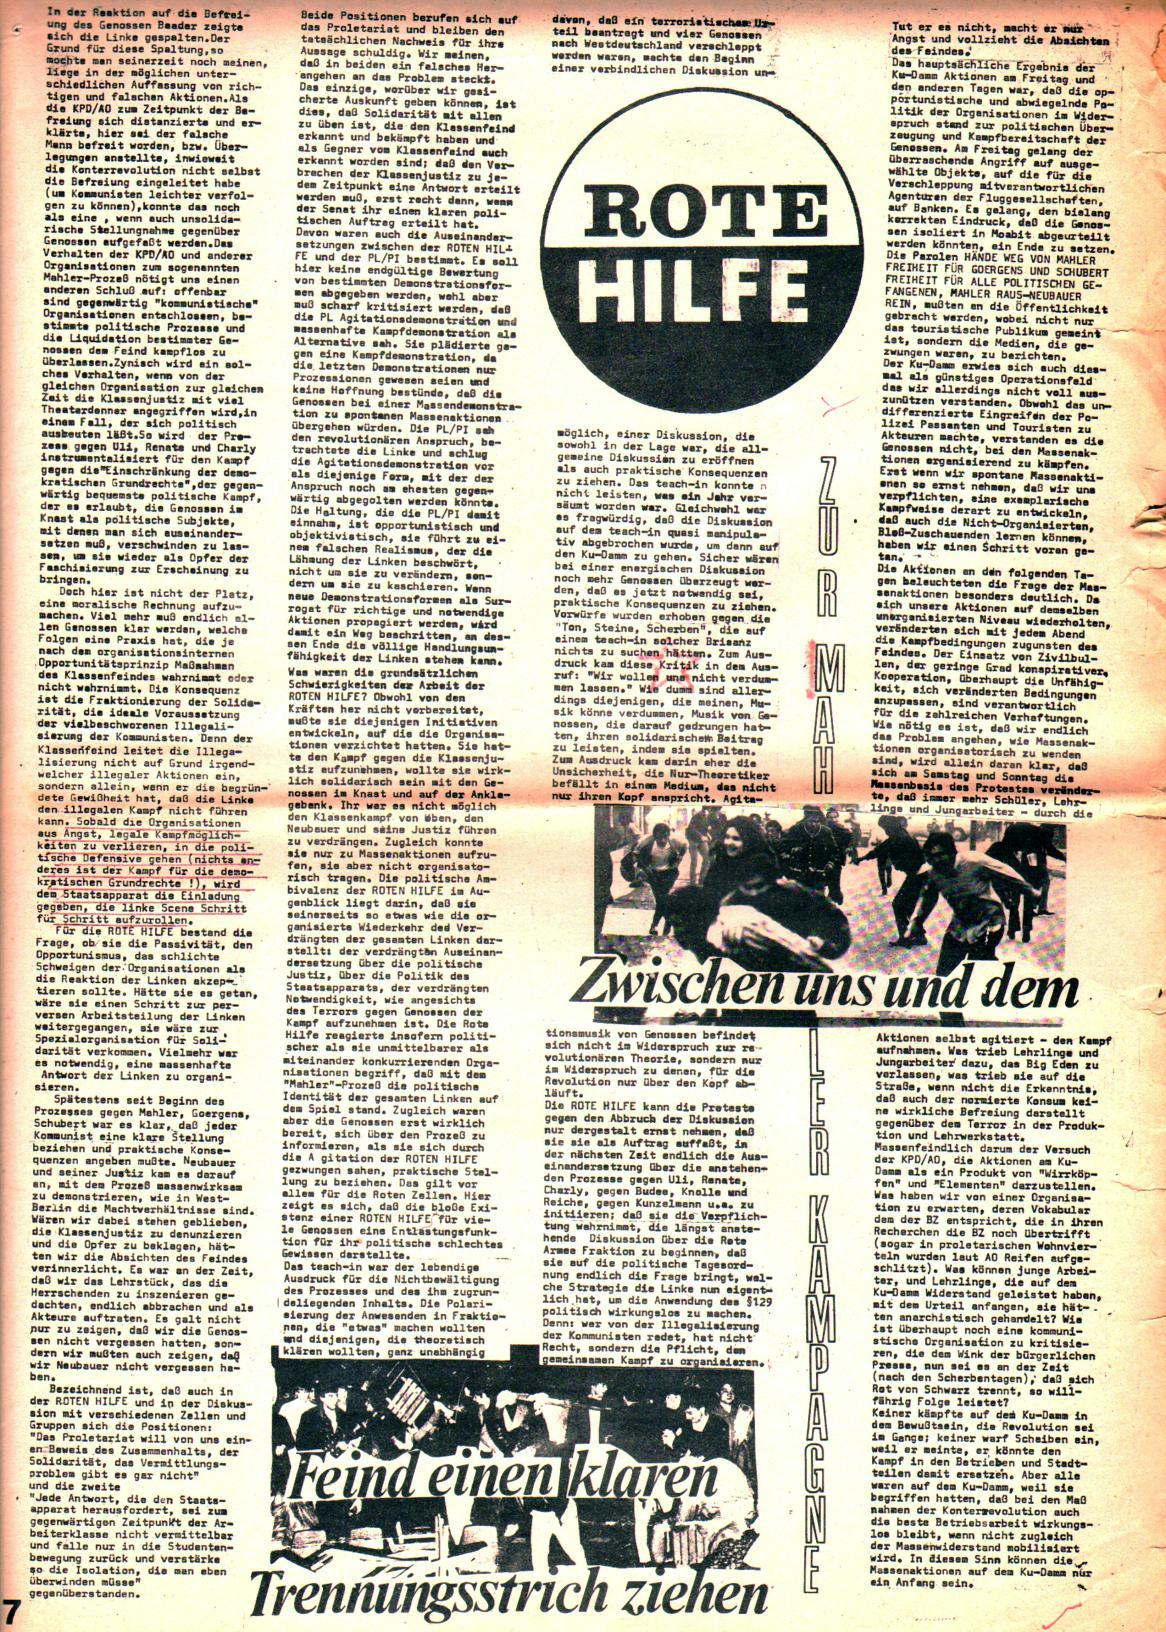 Berlin_Hochschulkampf_1971_11_07